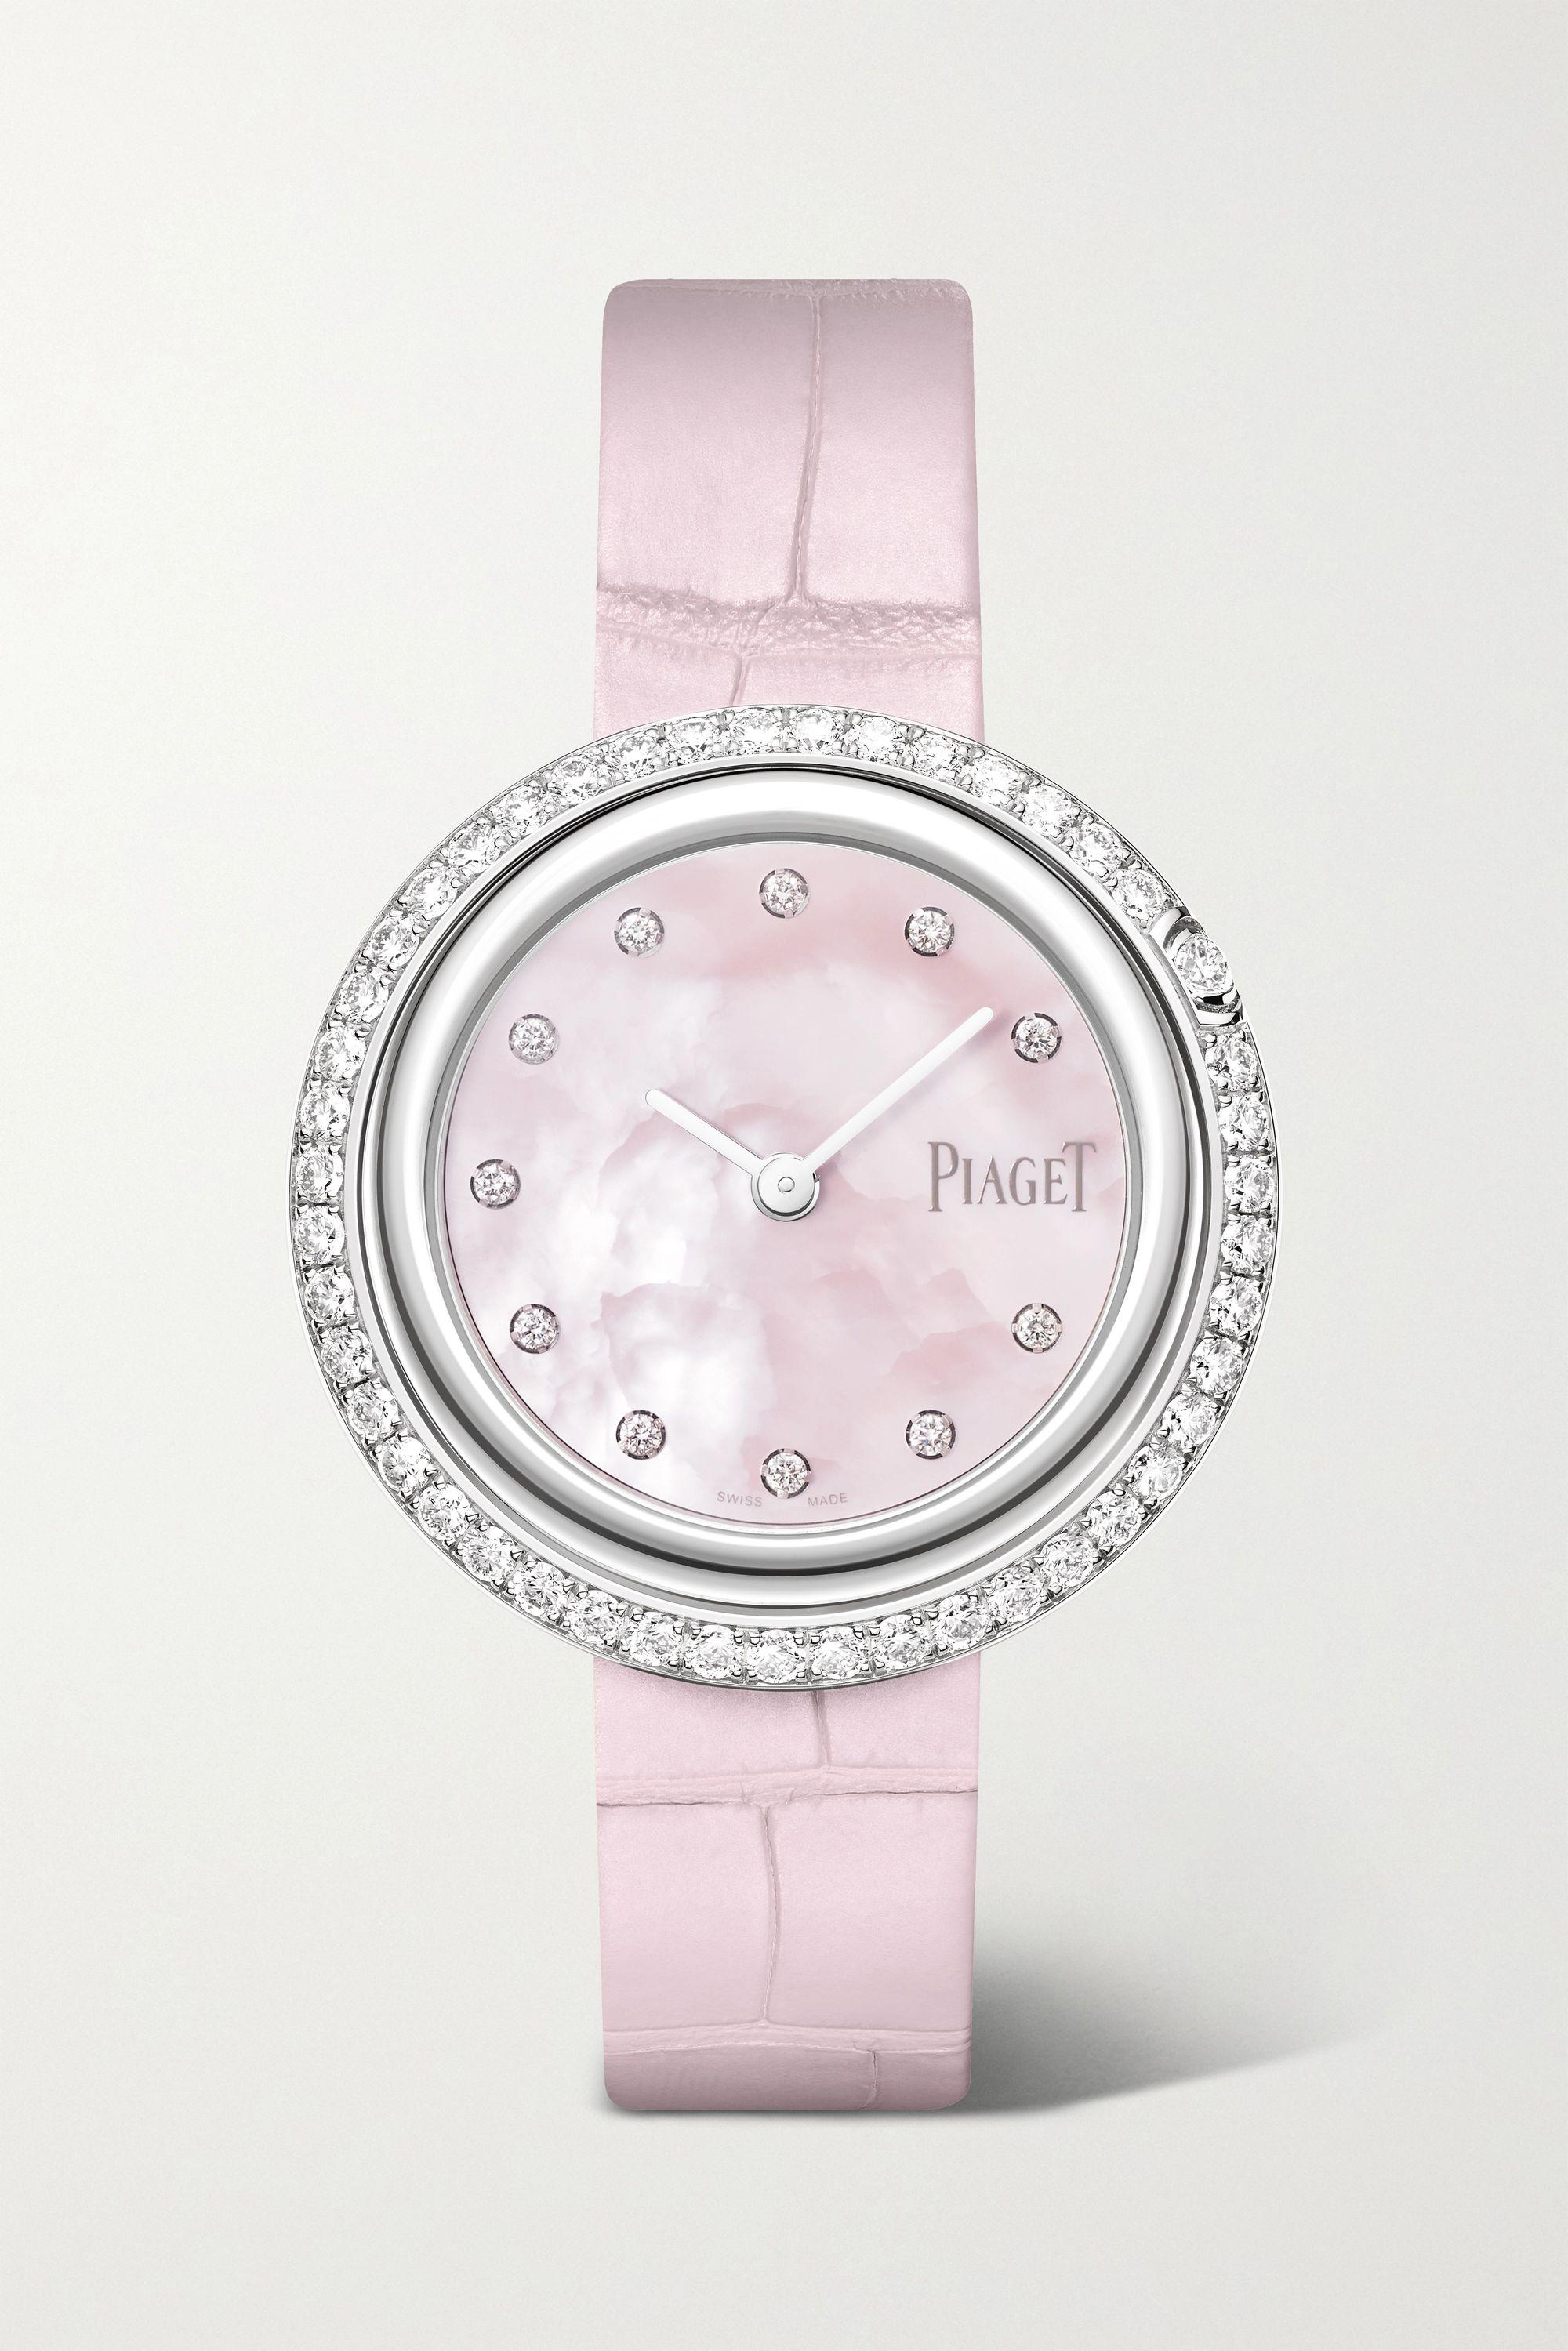 Piaget Possession 34 毫米 18K 白金钻石腕表(短吻鳄鱼皮表带)